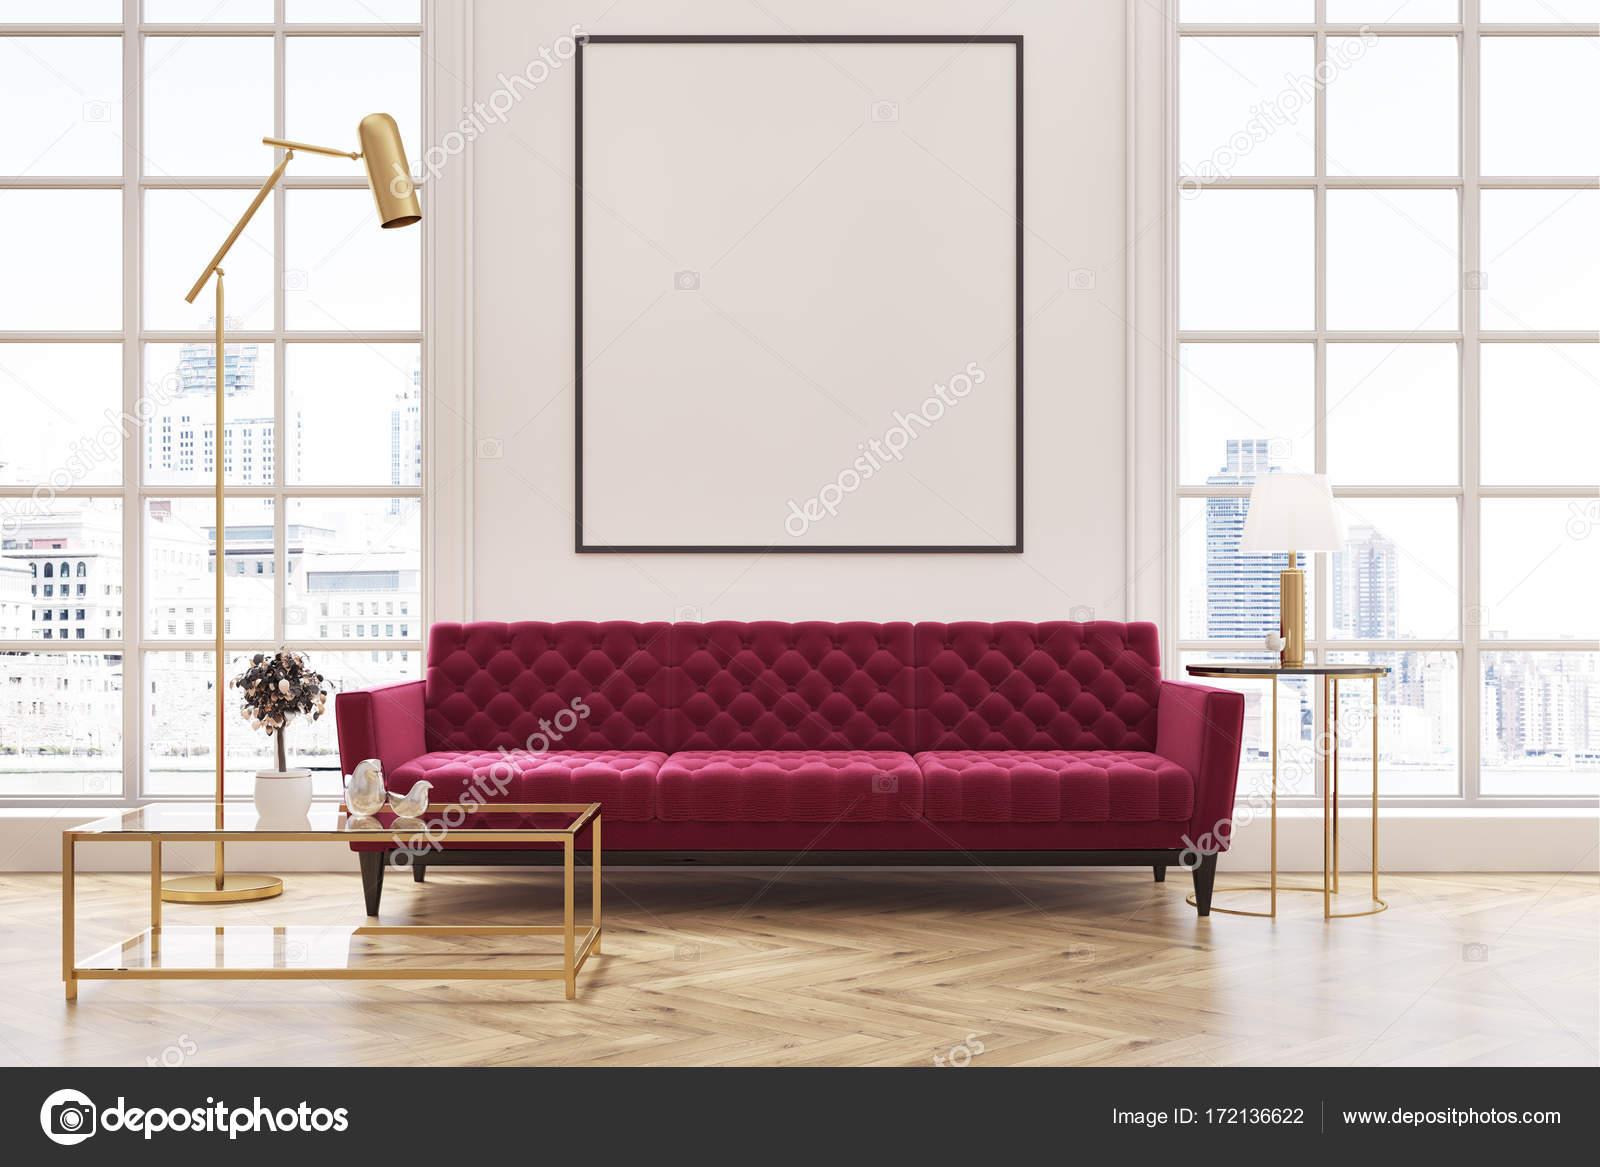 Weisse Wohnzimmer Rotes Sofa Plakat Stockfoto C Denisismagilov